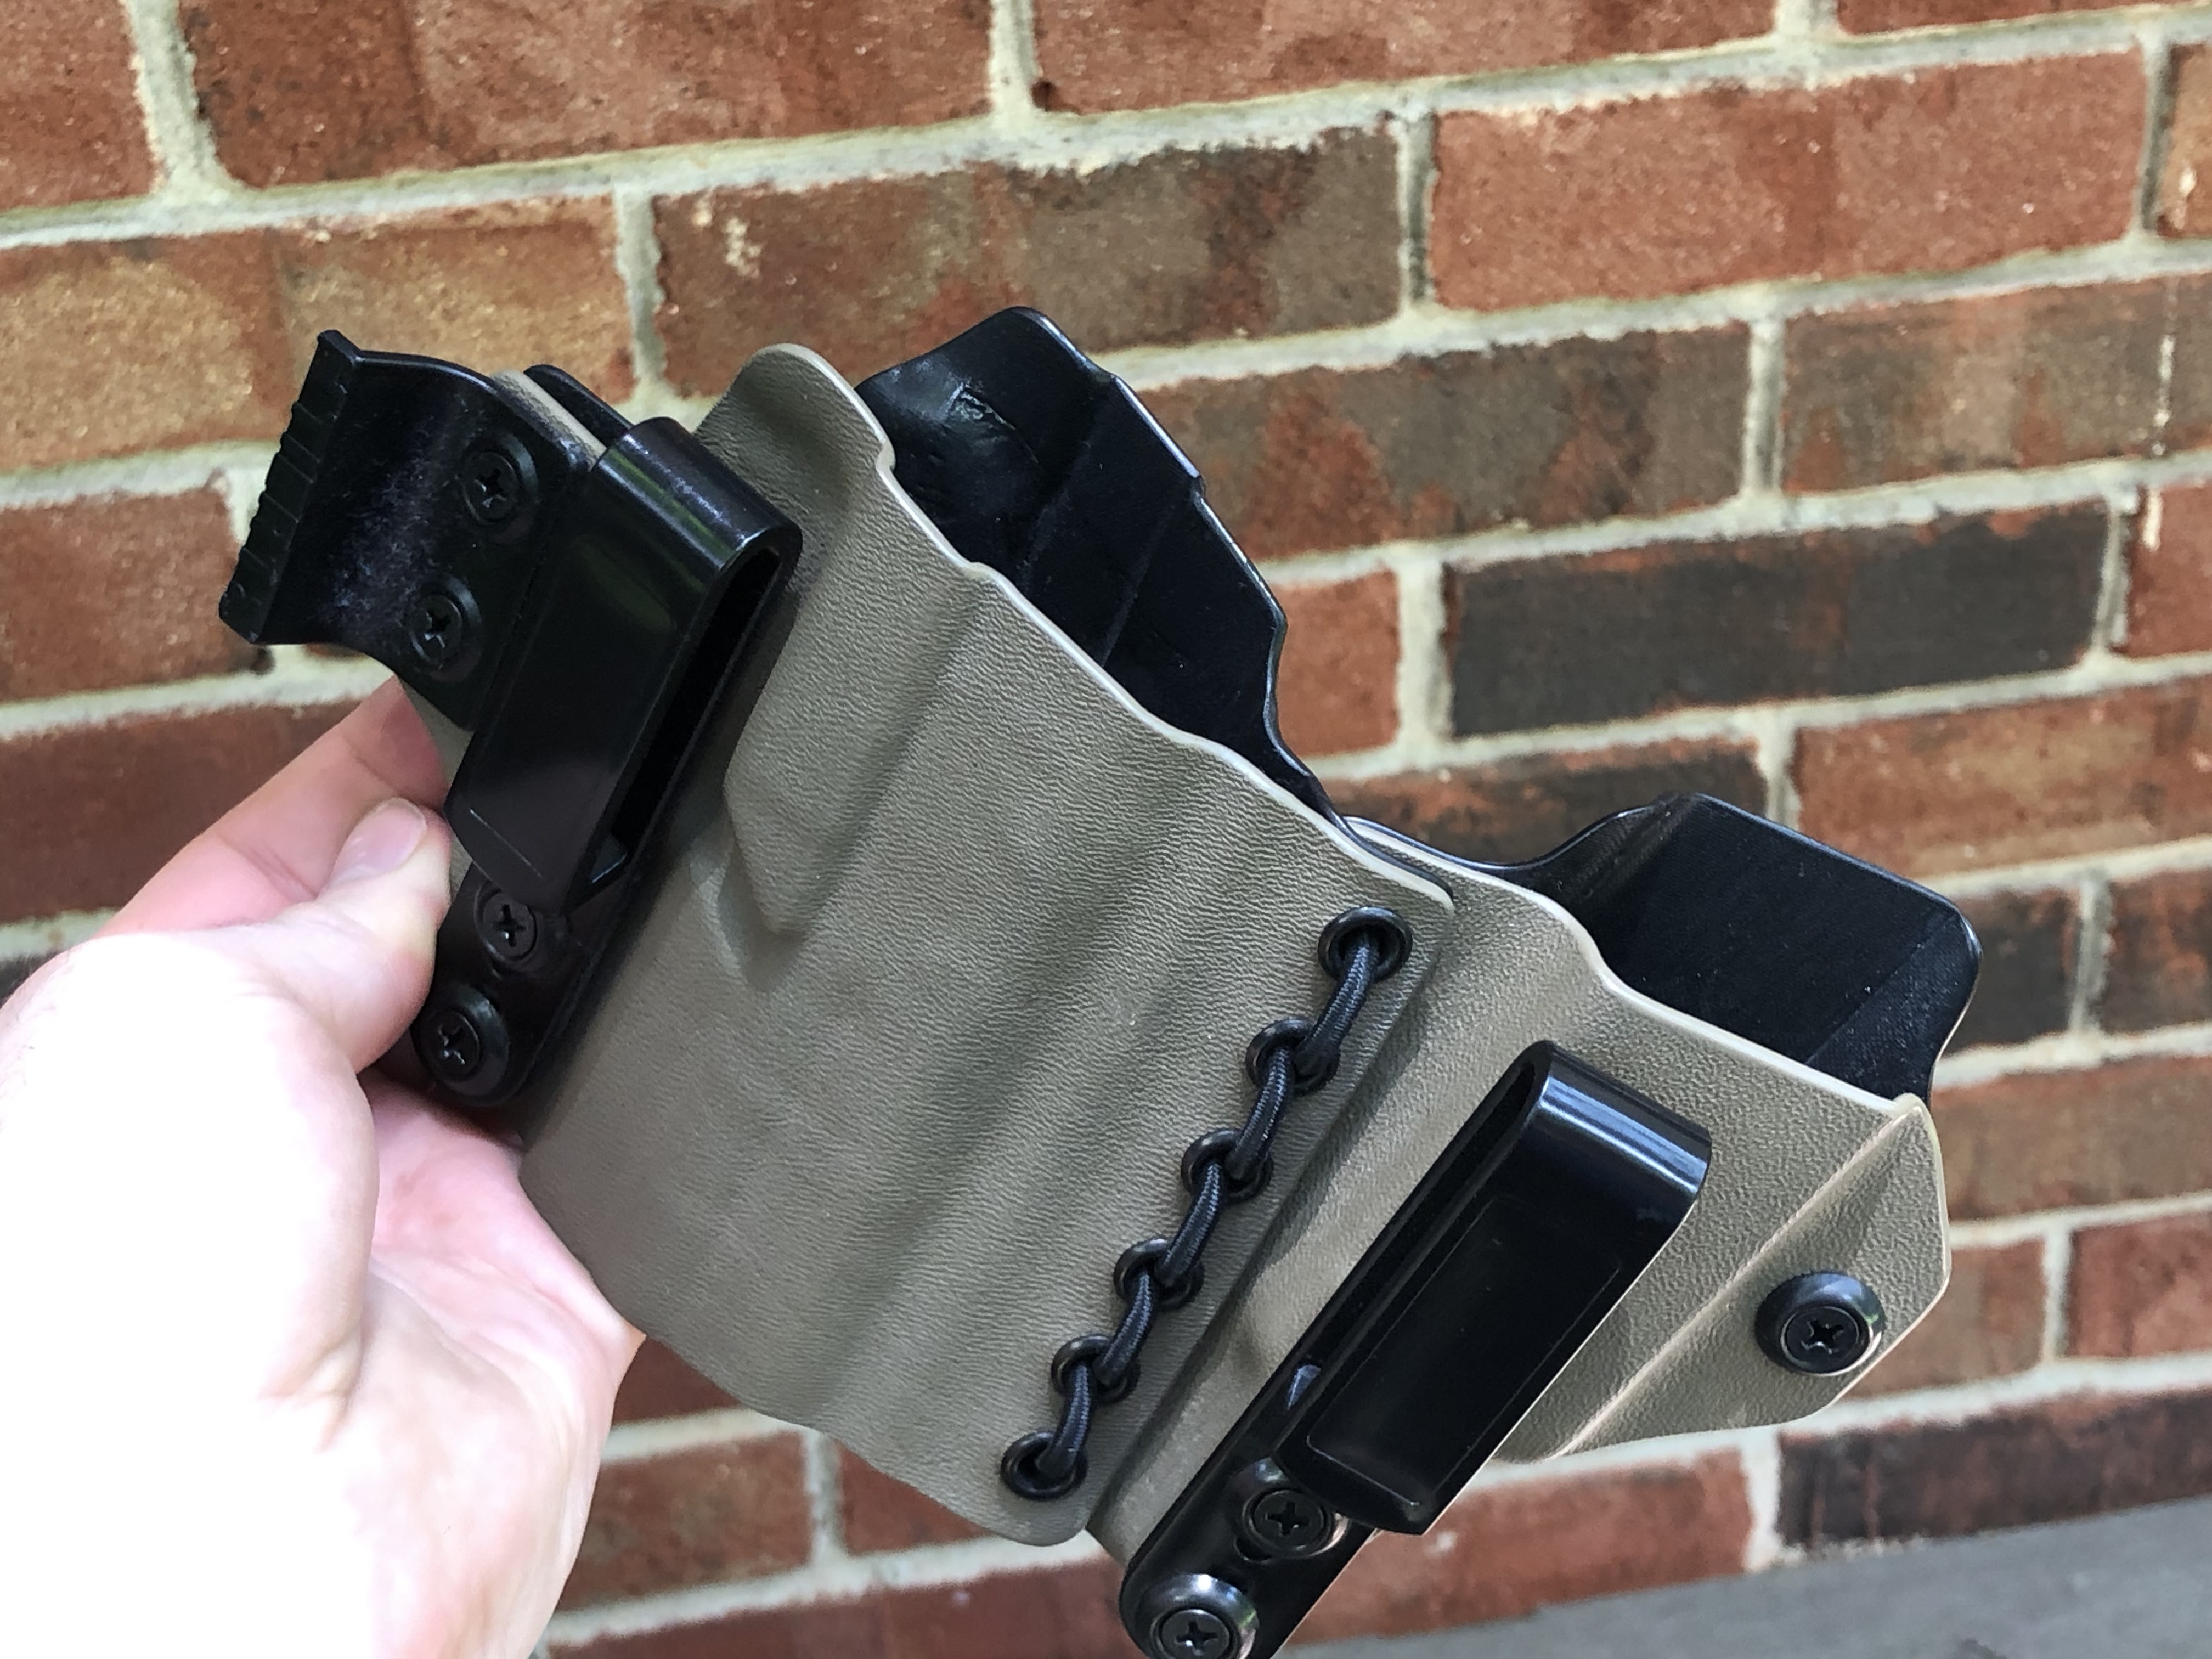 WTS - Like new T-Rex Arms Sidecar P30L appendix holster-hgh8-vm-tbqnfr7fsbazmw.jpg